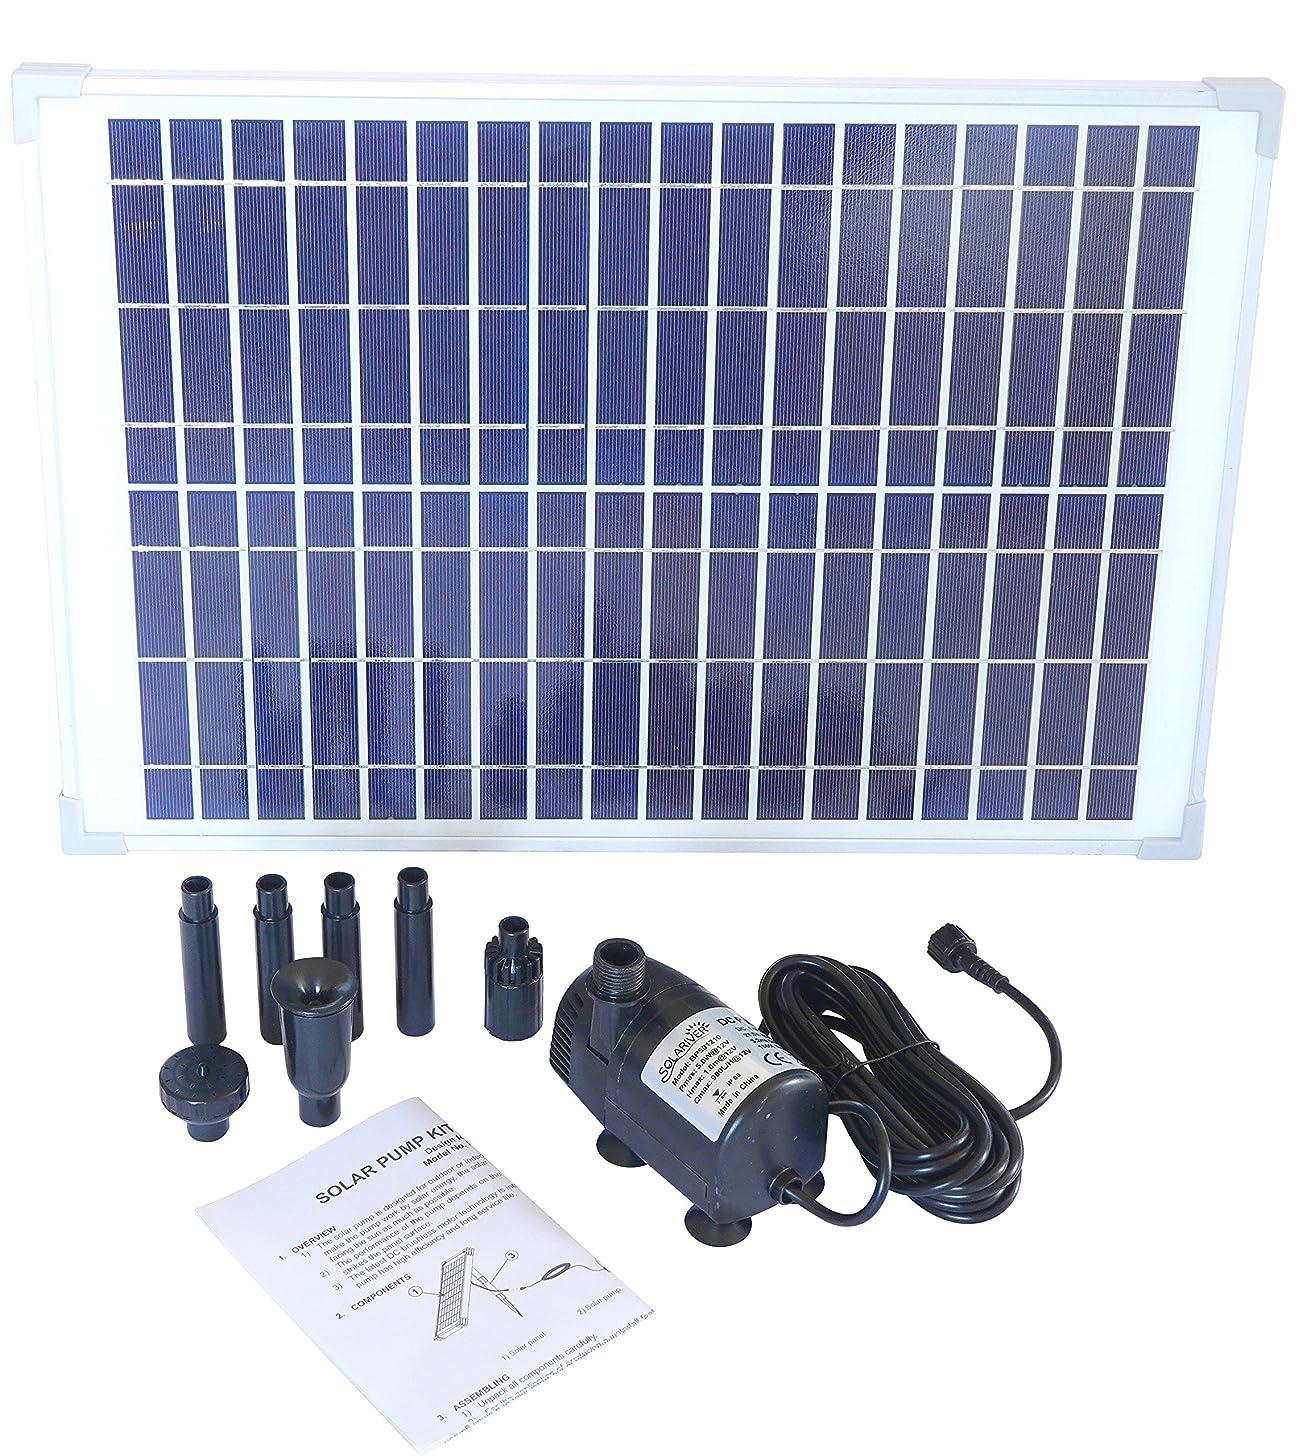 Solariver Solar Water Pump Kit - 360+GPH - Submersible Pump and 20 Watt Solar Panel for Sun Powered Fountain, Waterfall, Pond Aeration, Hydroponics, Aquarium, Aquaculture (No Battery Backup)